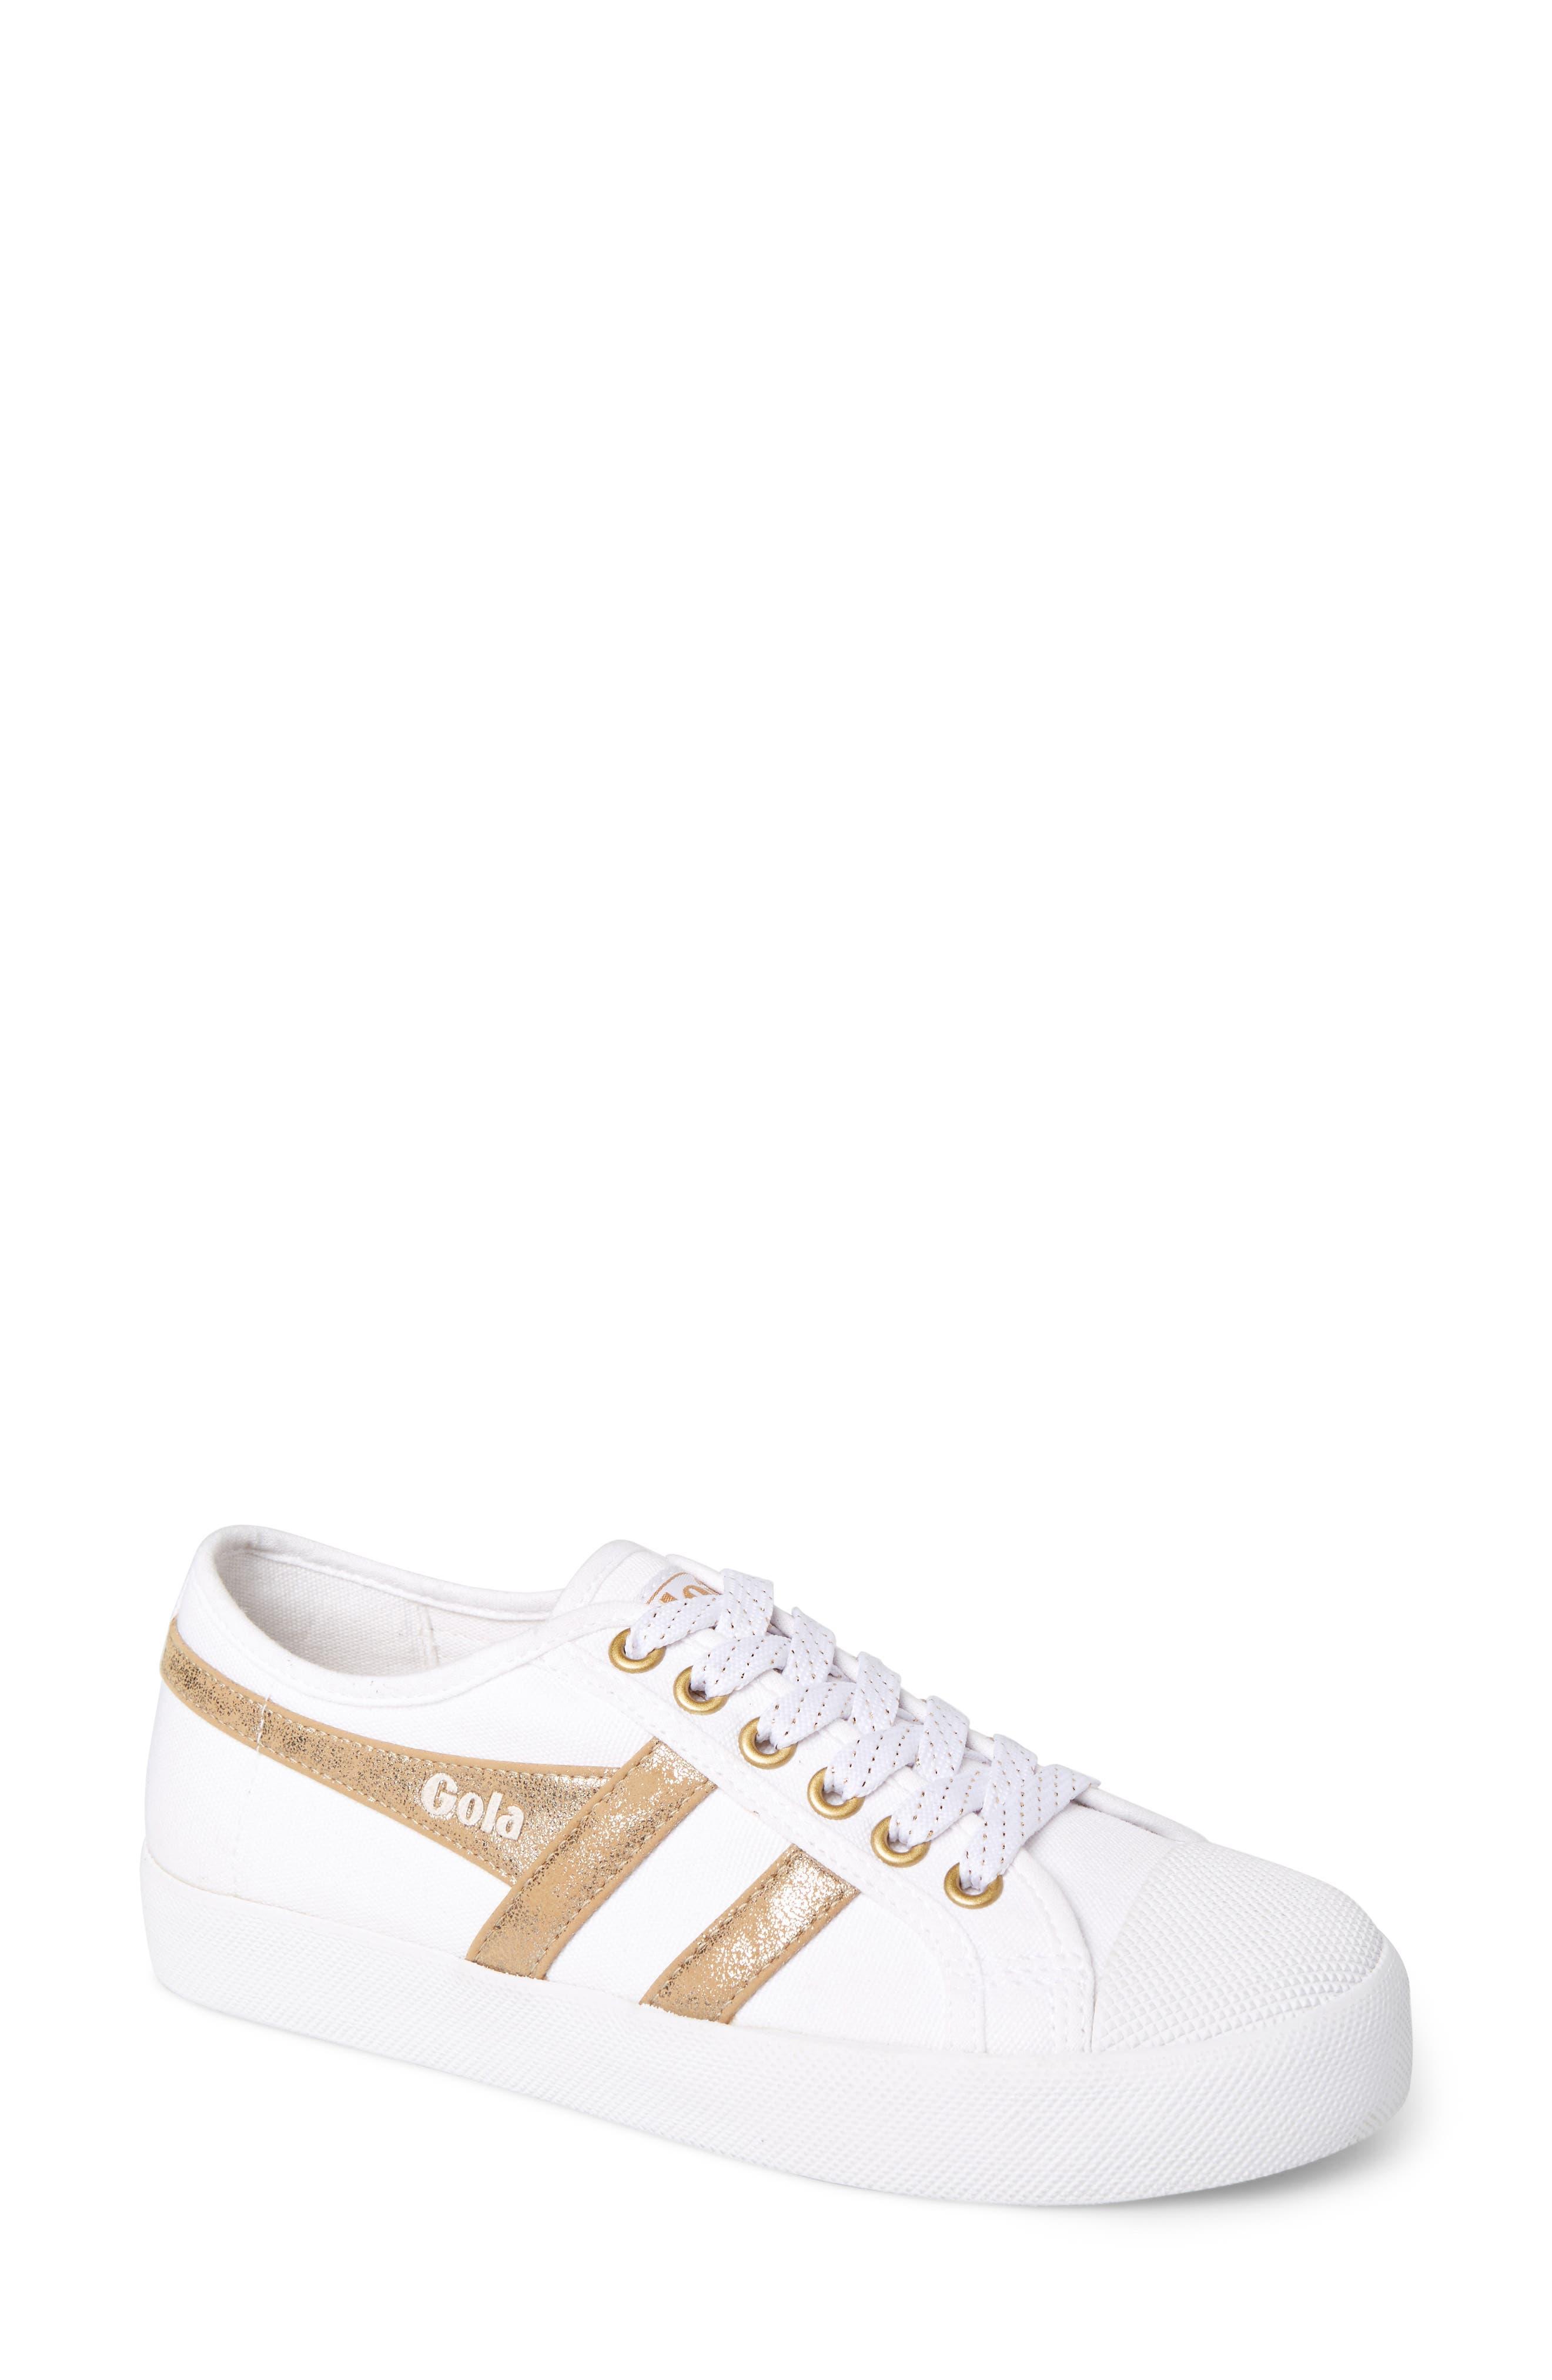 Coaster Mirror Sneaker,                         Main,                         color, White/ Gold